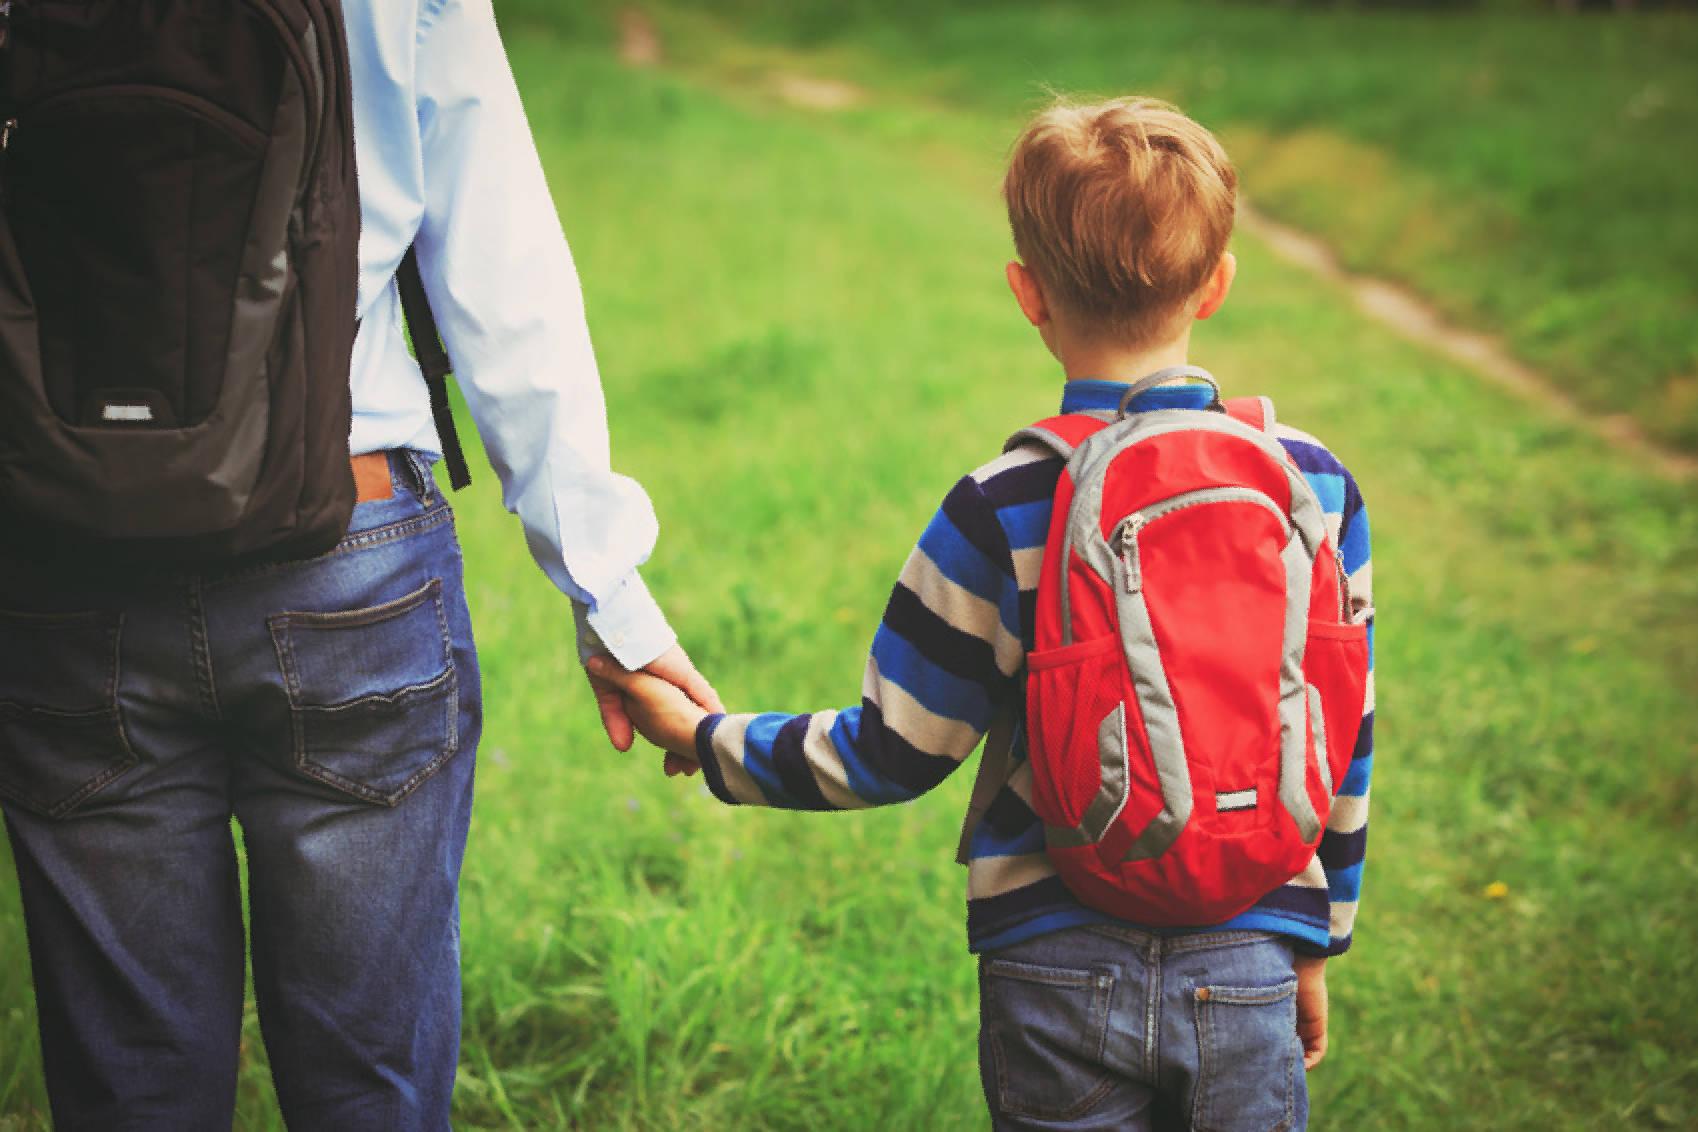 Father walking son to school or daycare. Copyright nadezhda1906 - fotolia